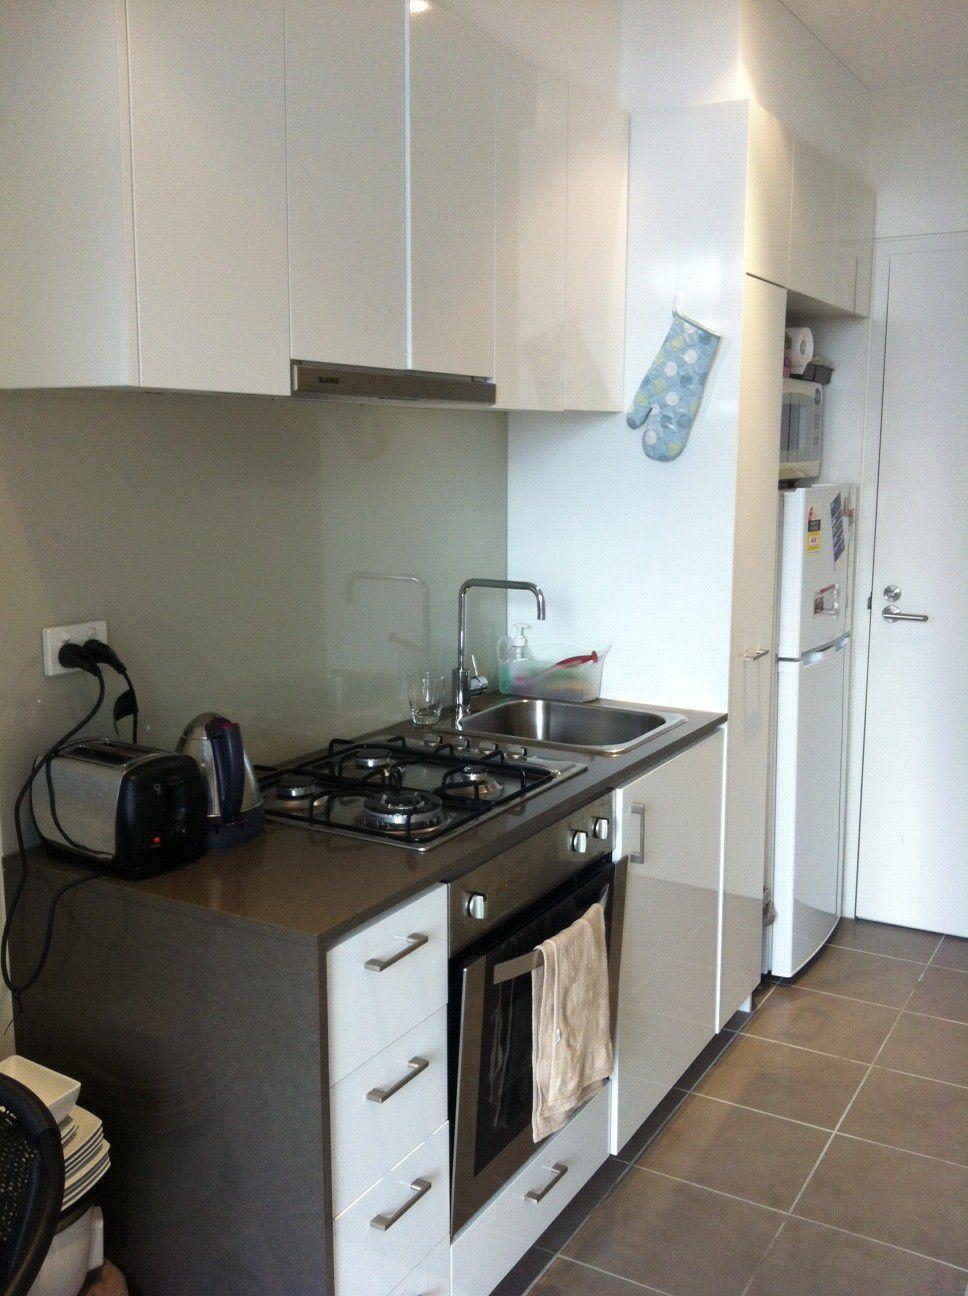 2803 380 Lt Lonsdale Street Melbourne VIC 3000 Apartment For Sale 201273